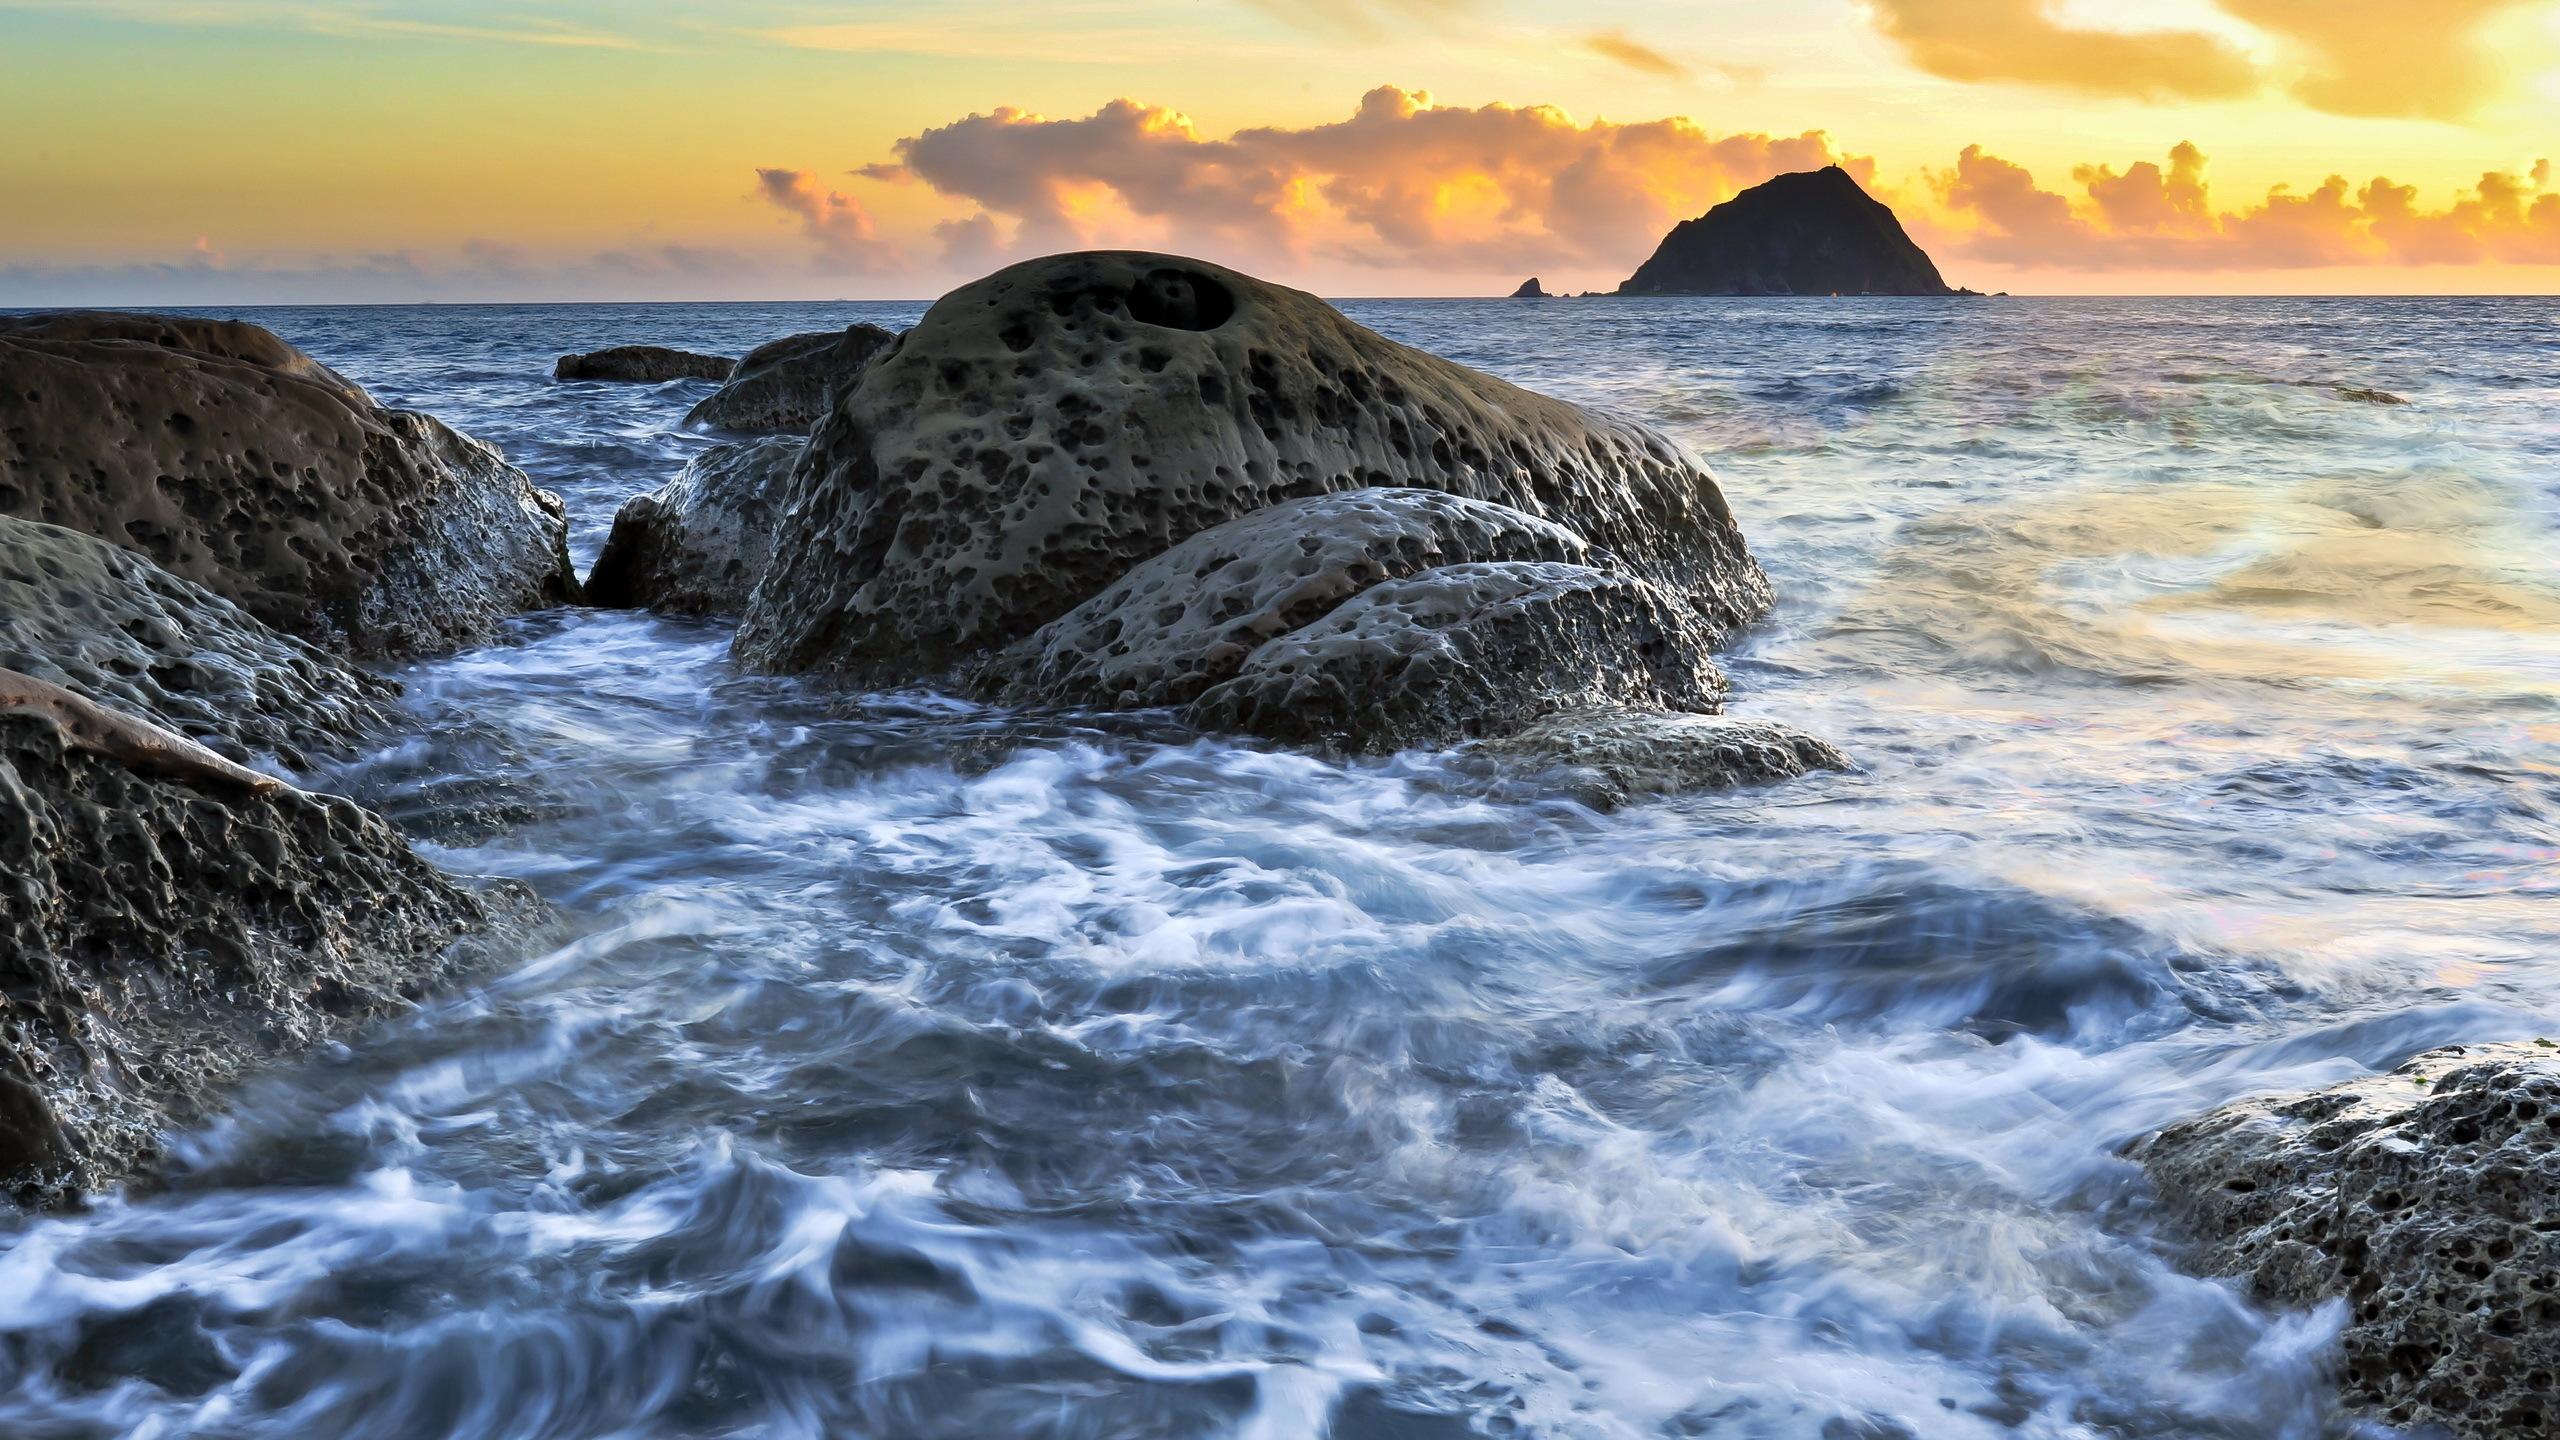 ocean images free hd